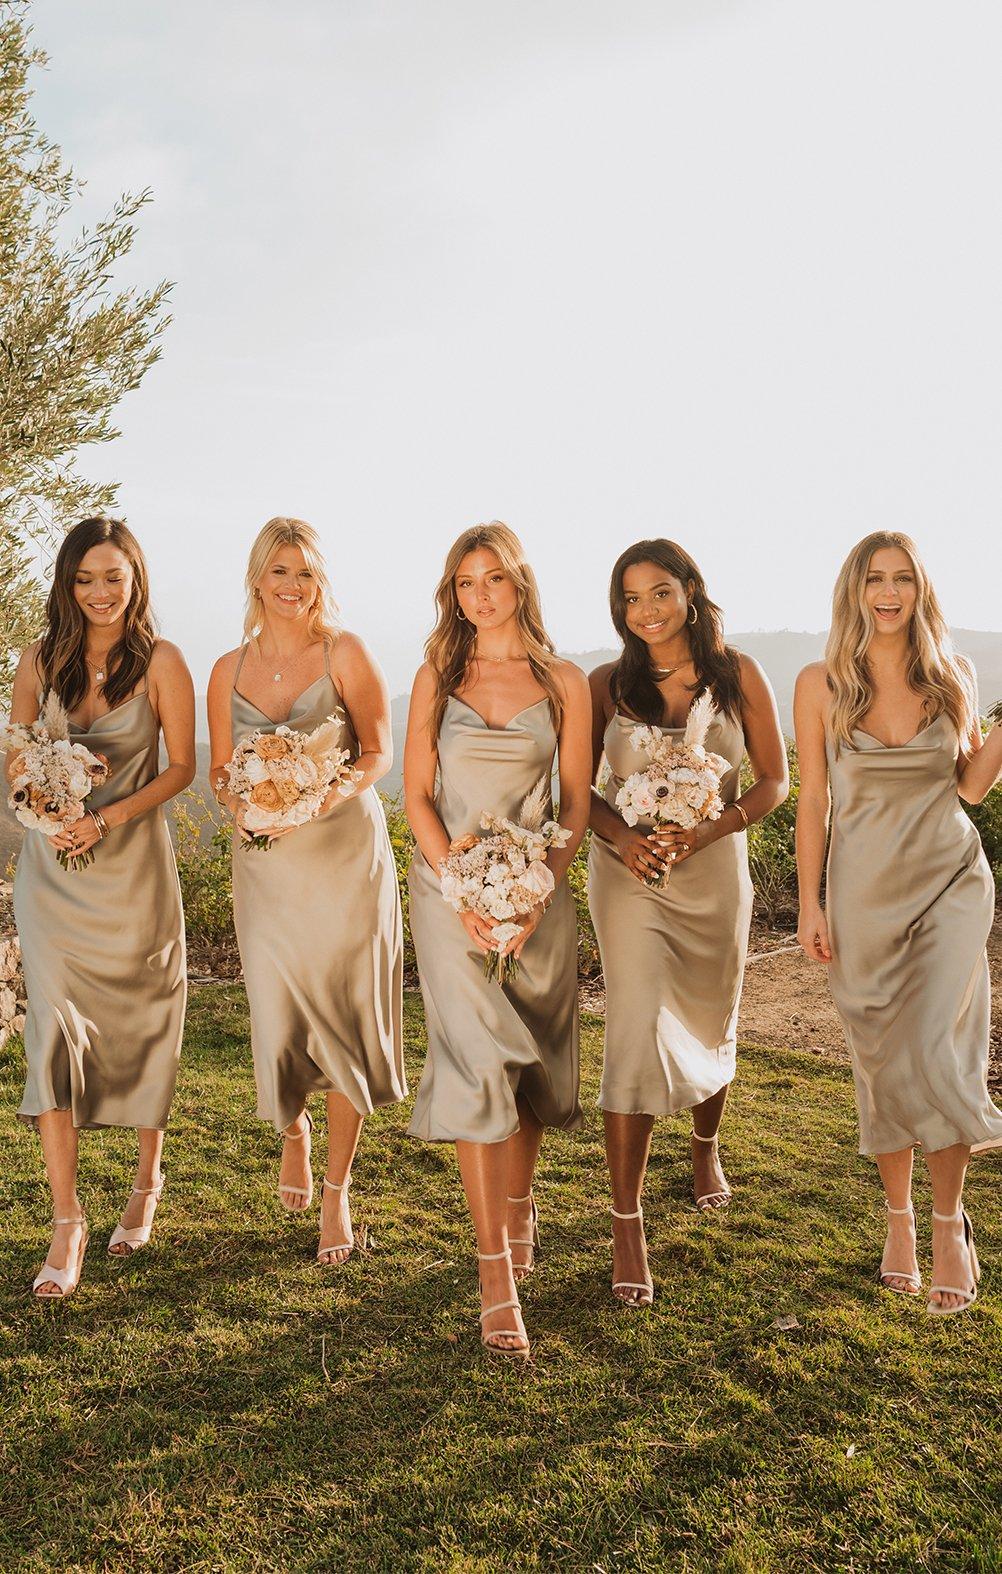 bridesmaid dresses, bridesmaid dress ideas, bridesmaid dress colors, bridesmaid dress styles, satin bridesmaid dress, green bridesmaid dress